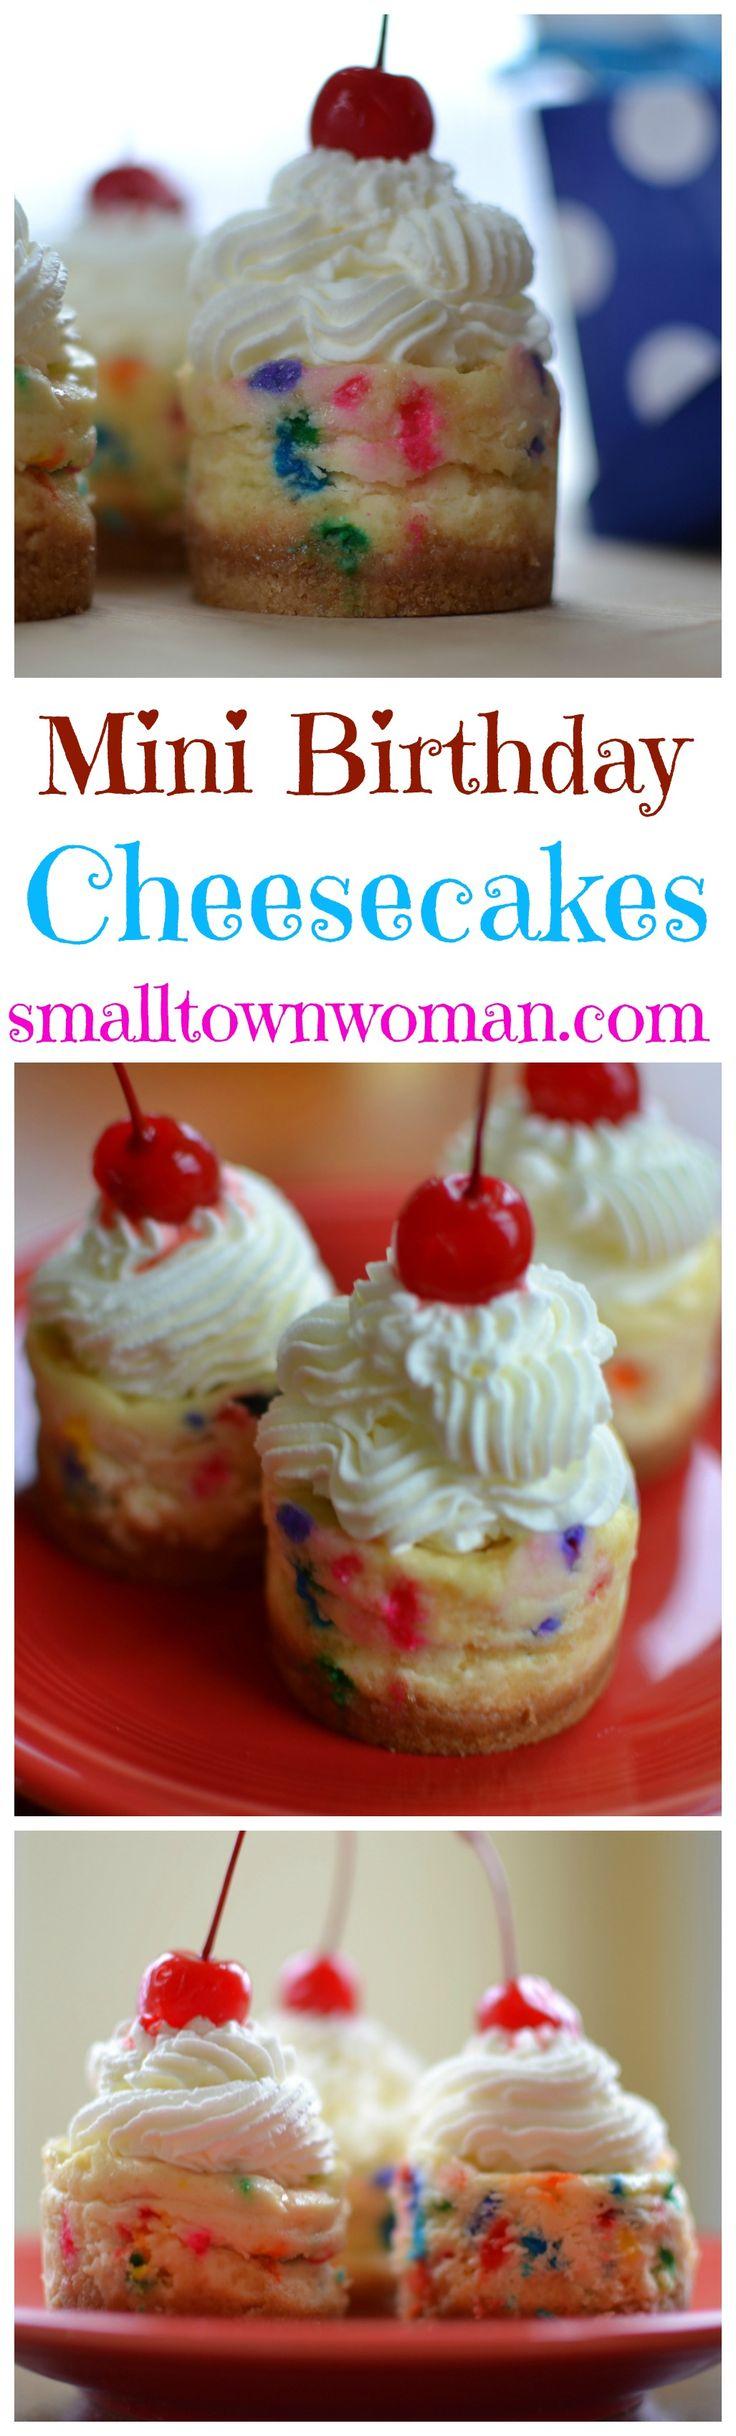 468 best Cake Decorating images on Pinterest Birthdays Postres